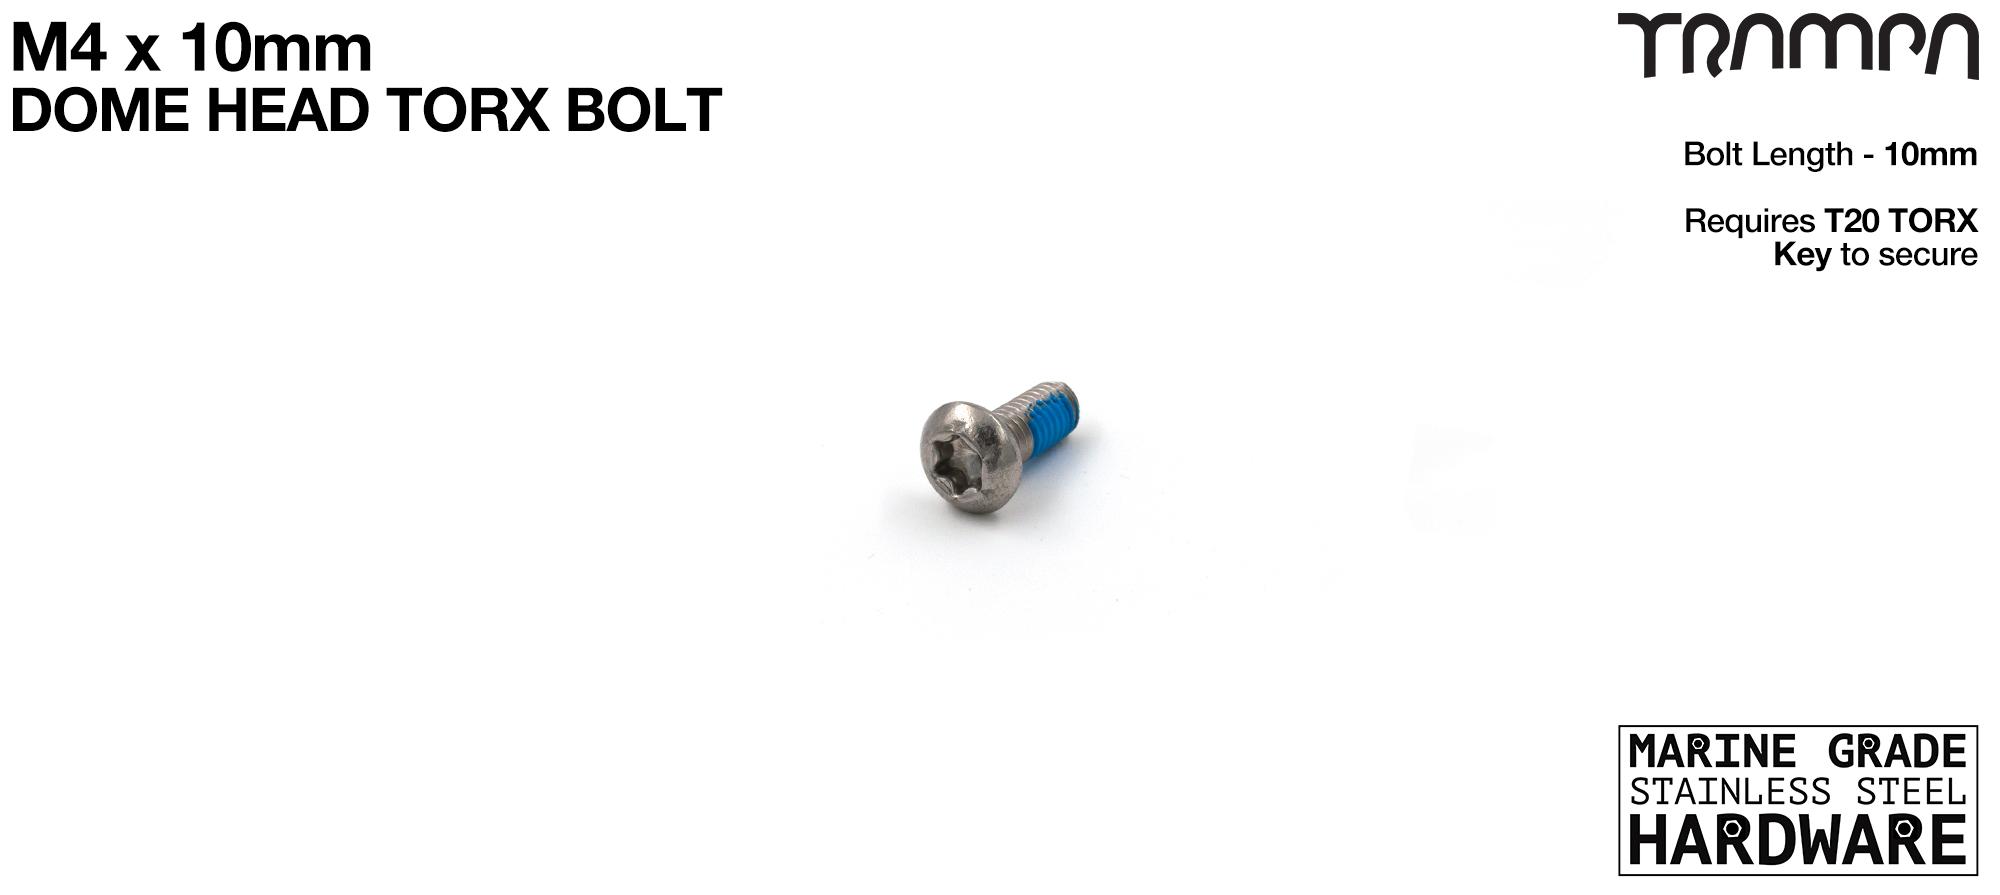 M4 x 10mm TORX Dome/Button Headed Head Bolt DIN6912 Marine Grade Stainless Steel TORX